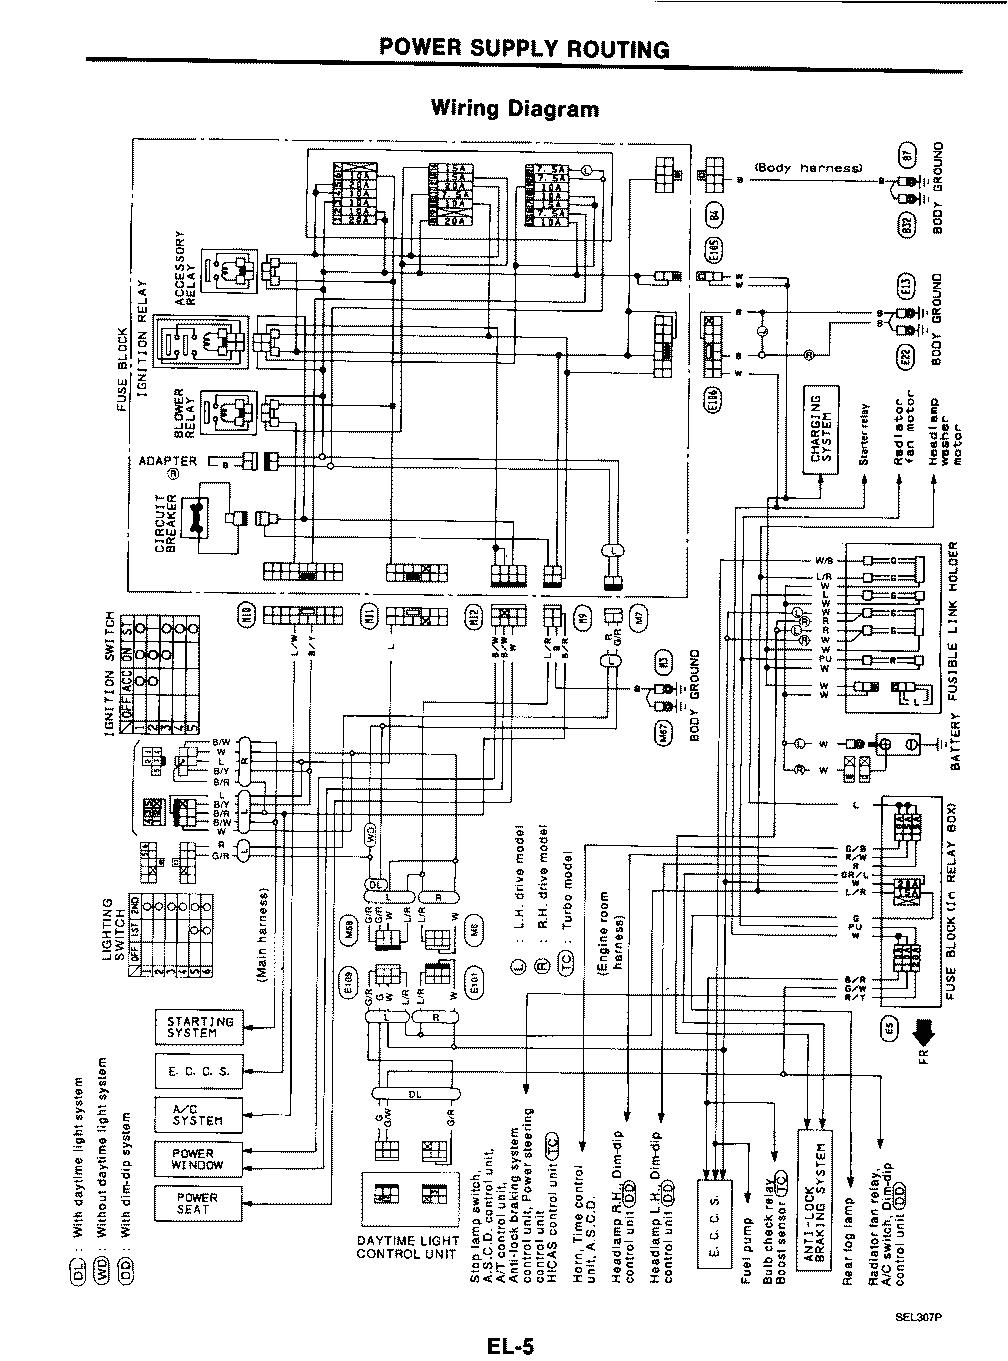 power supply wiring diagram nissan 300zx gif